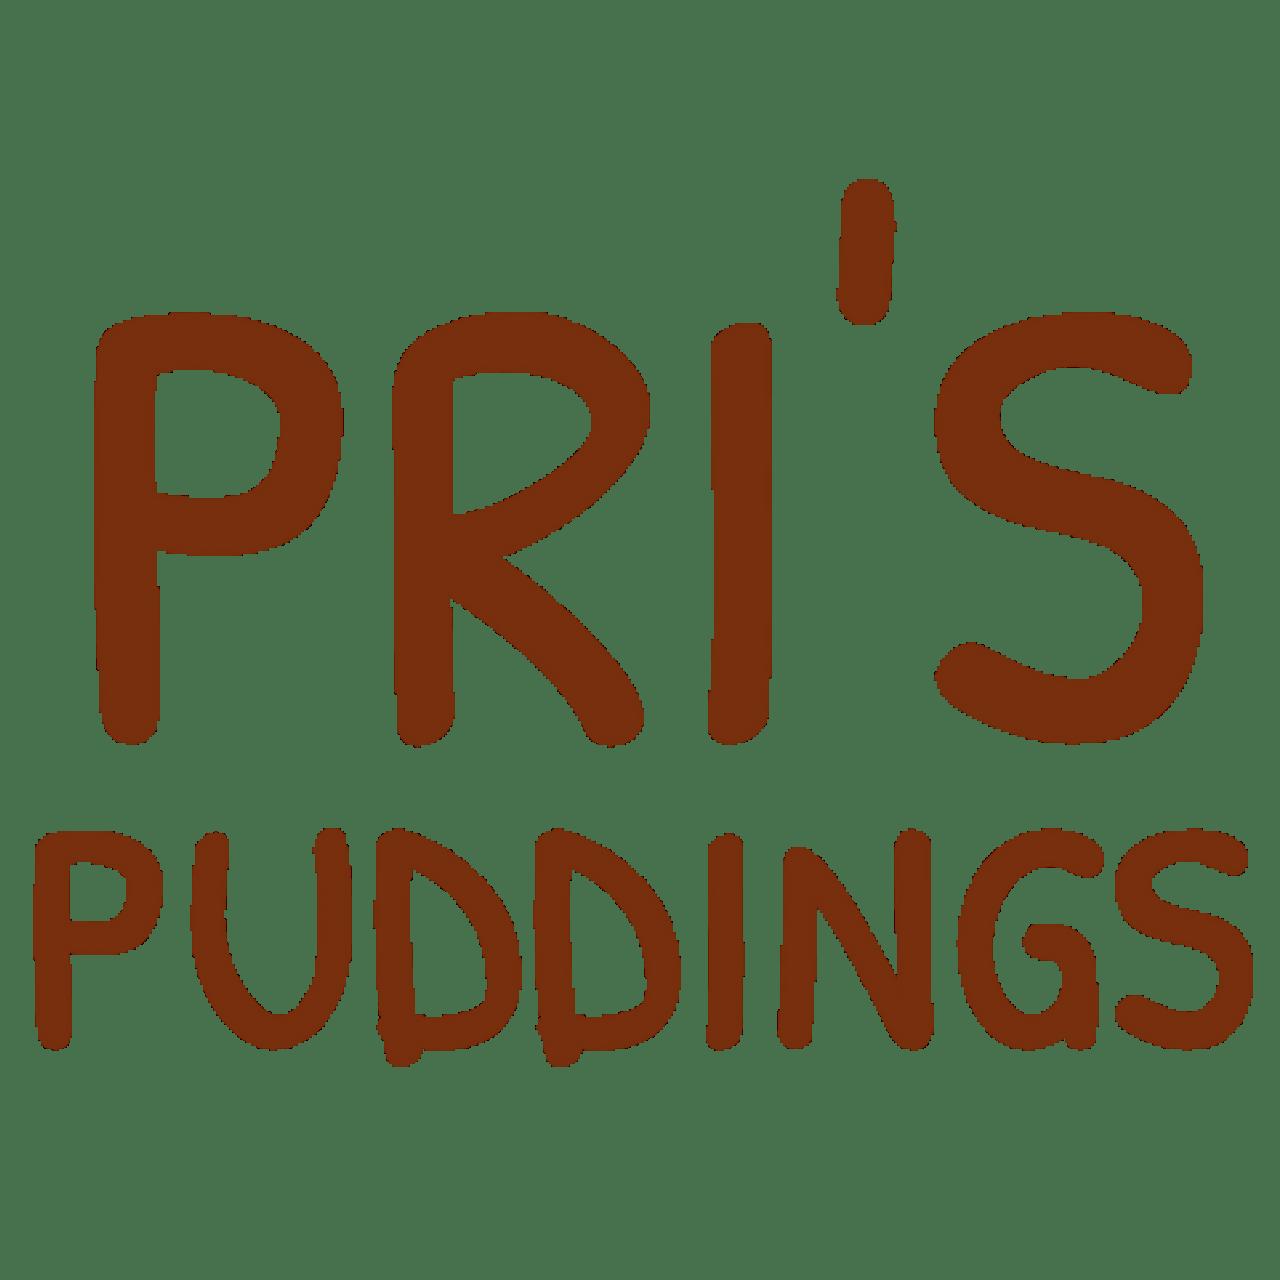 Pri's Puddings